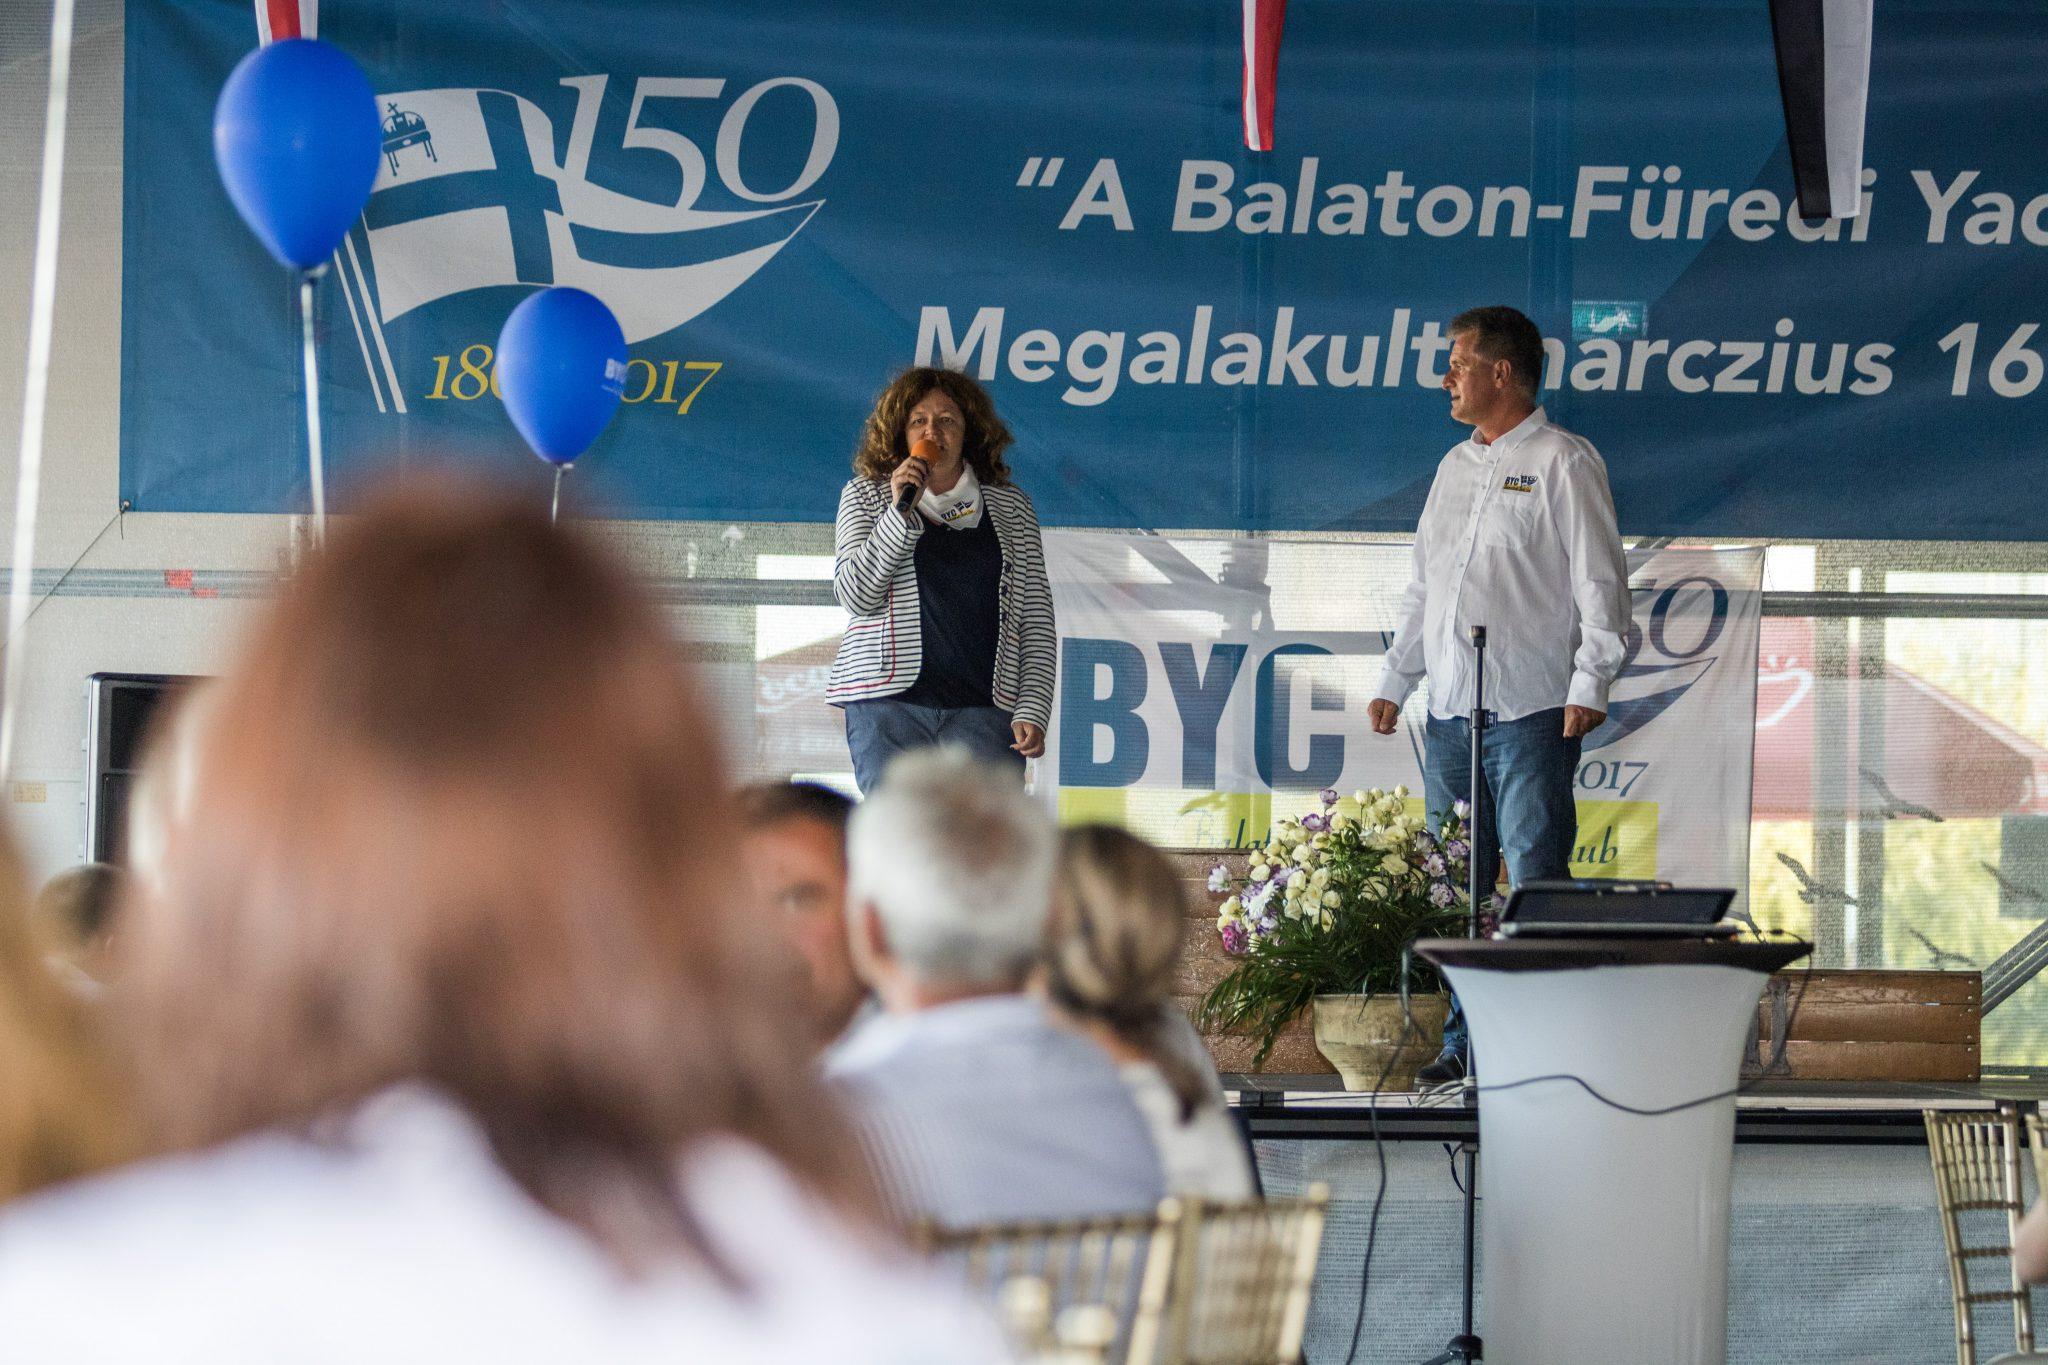 BYC150 Jubileumi Est 2017 @ Szabó Leó Balatonfüredi Yacht Club